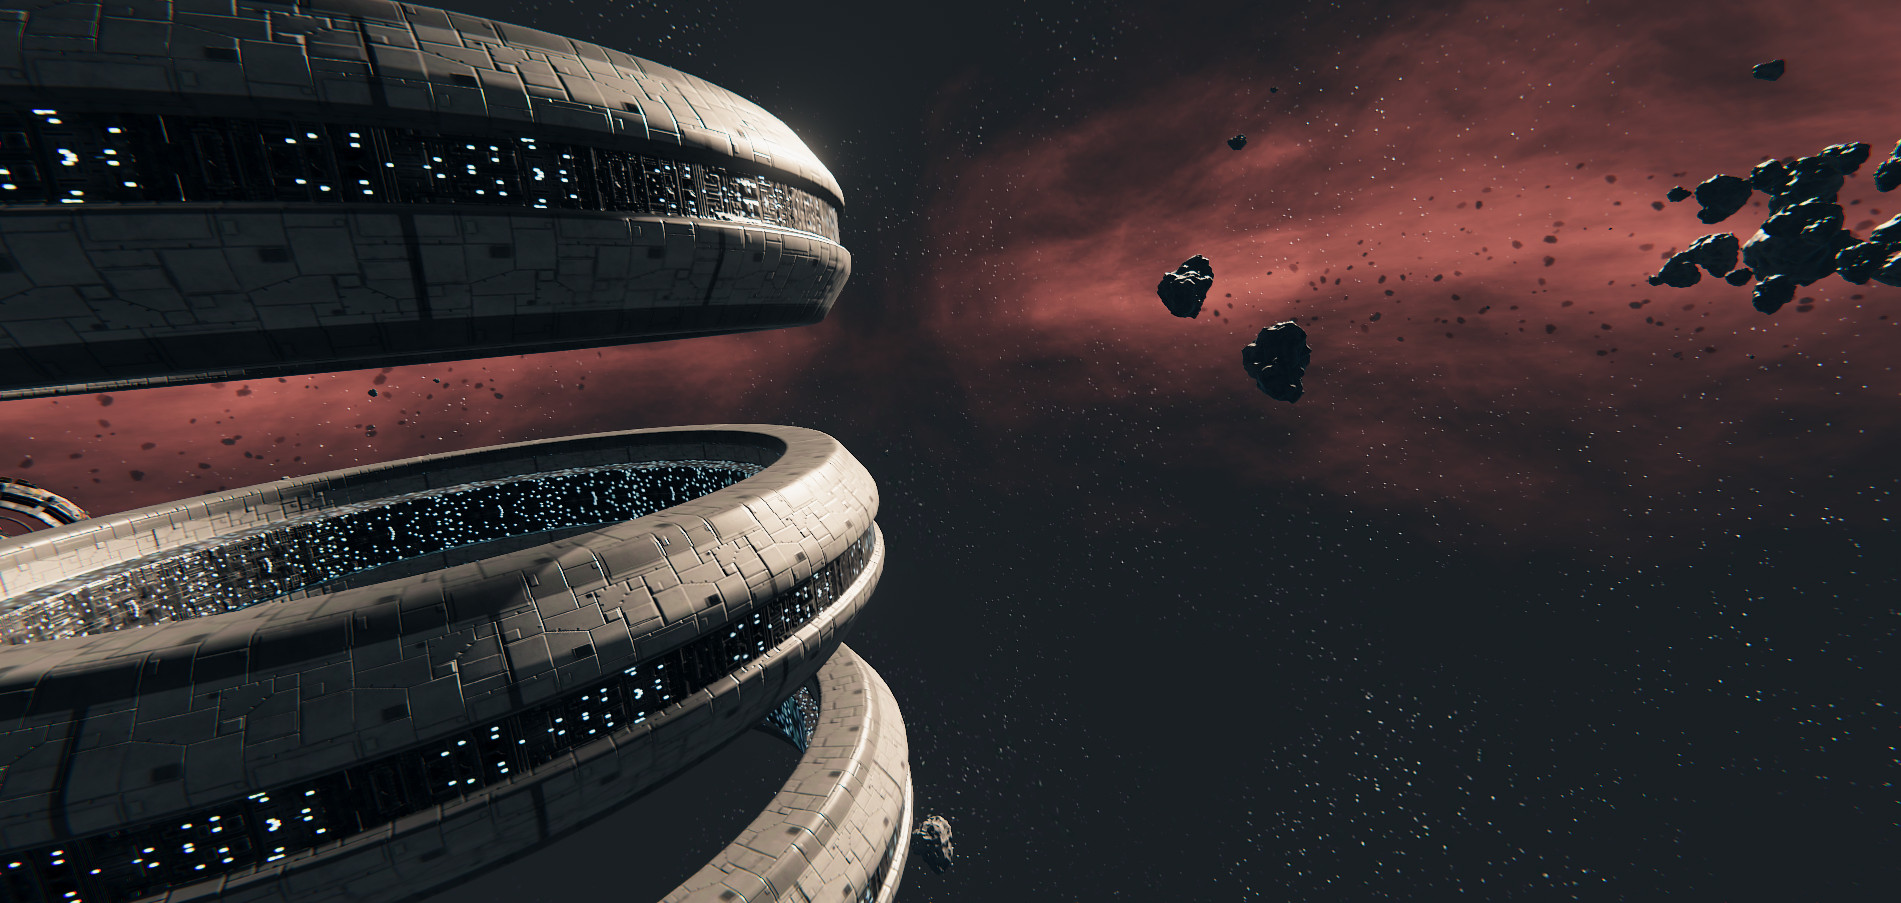 SpaceScene.jpg